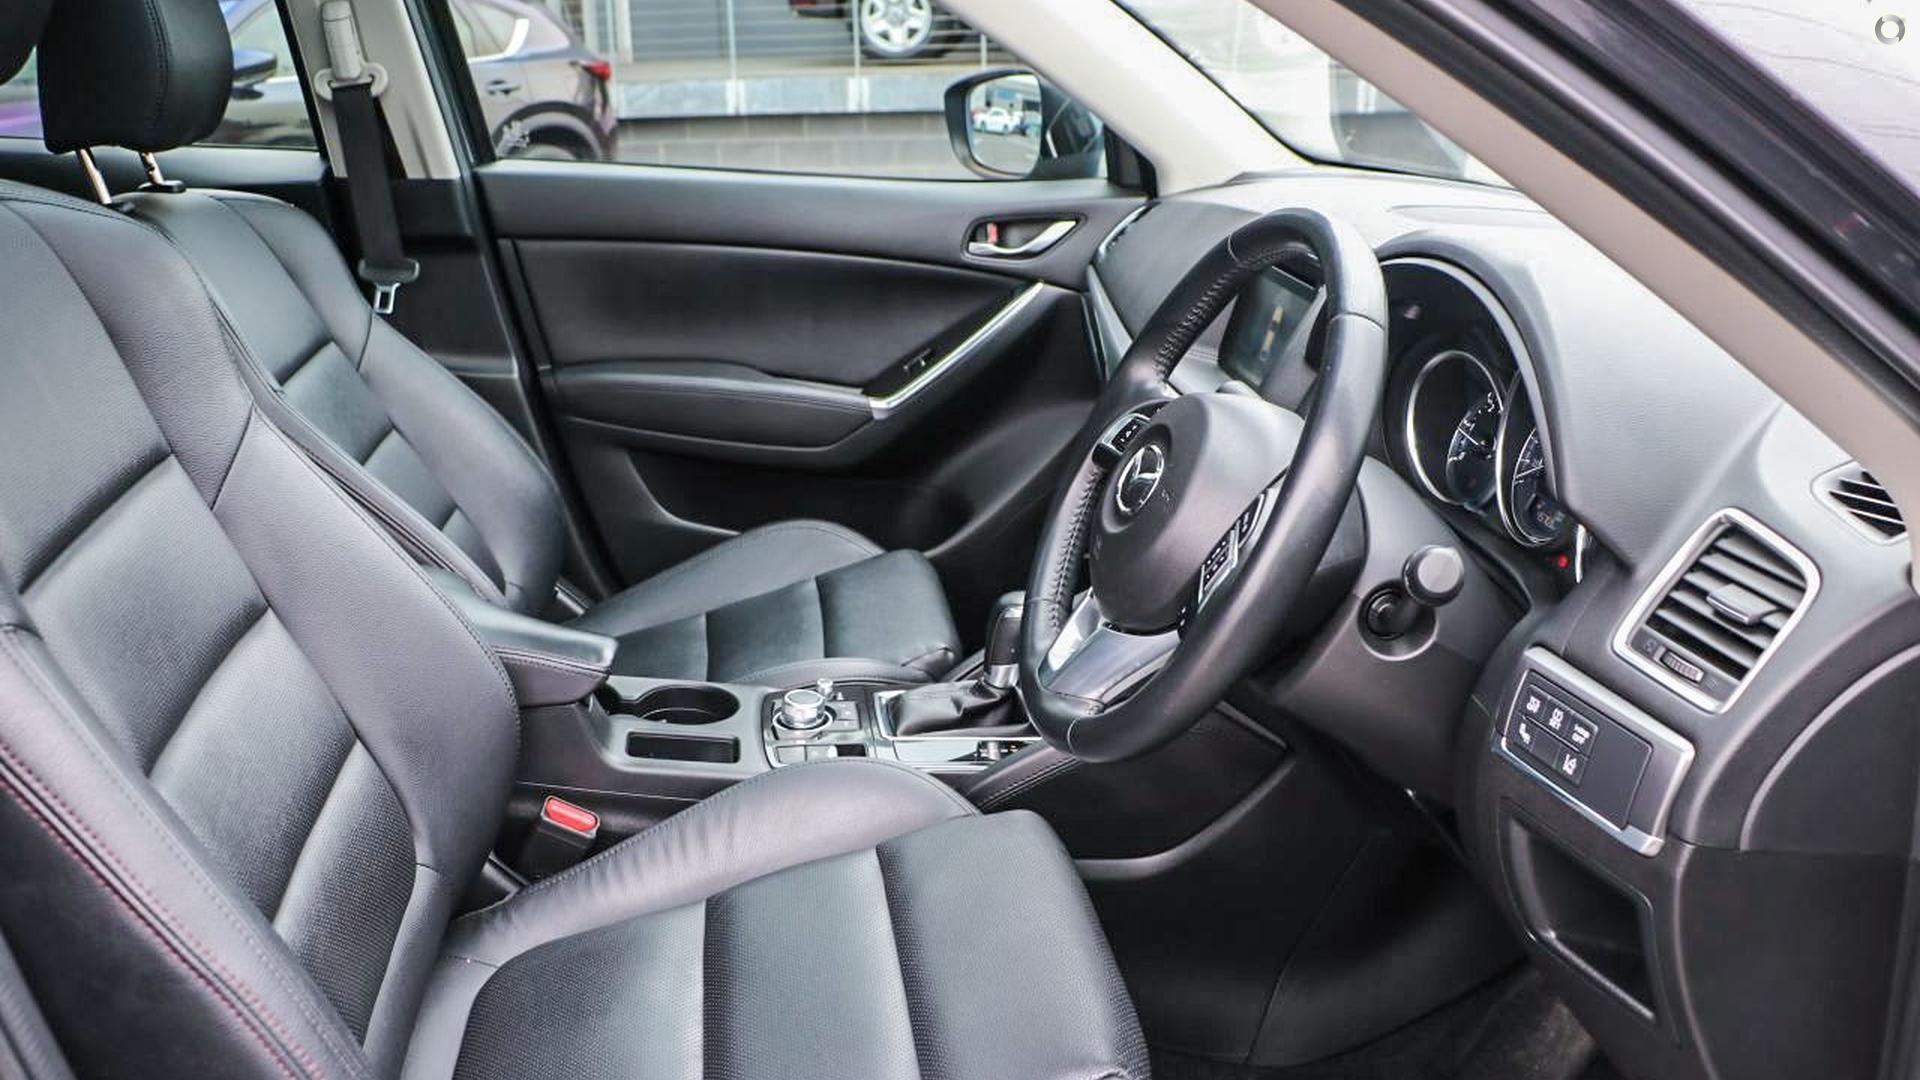 2016 Mazda Cx-5 Akera KE Series 2